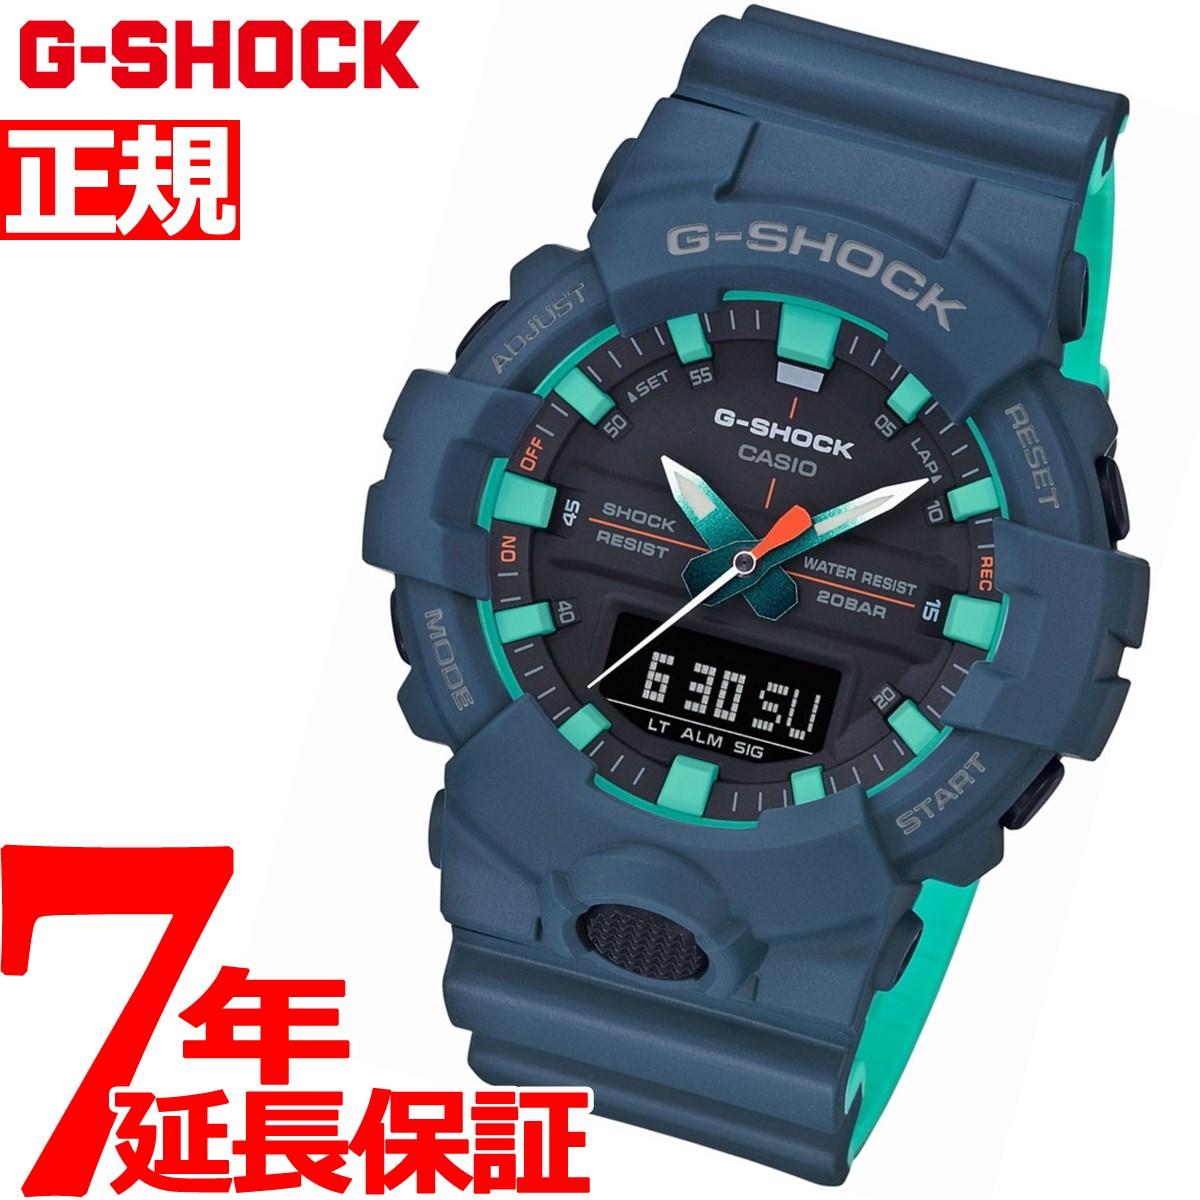 G-SHOCK アナデジ メンズ 腕時計 ネイビーブルー カシオ CASIO GA-800CC-2AJF【2018 新作】